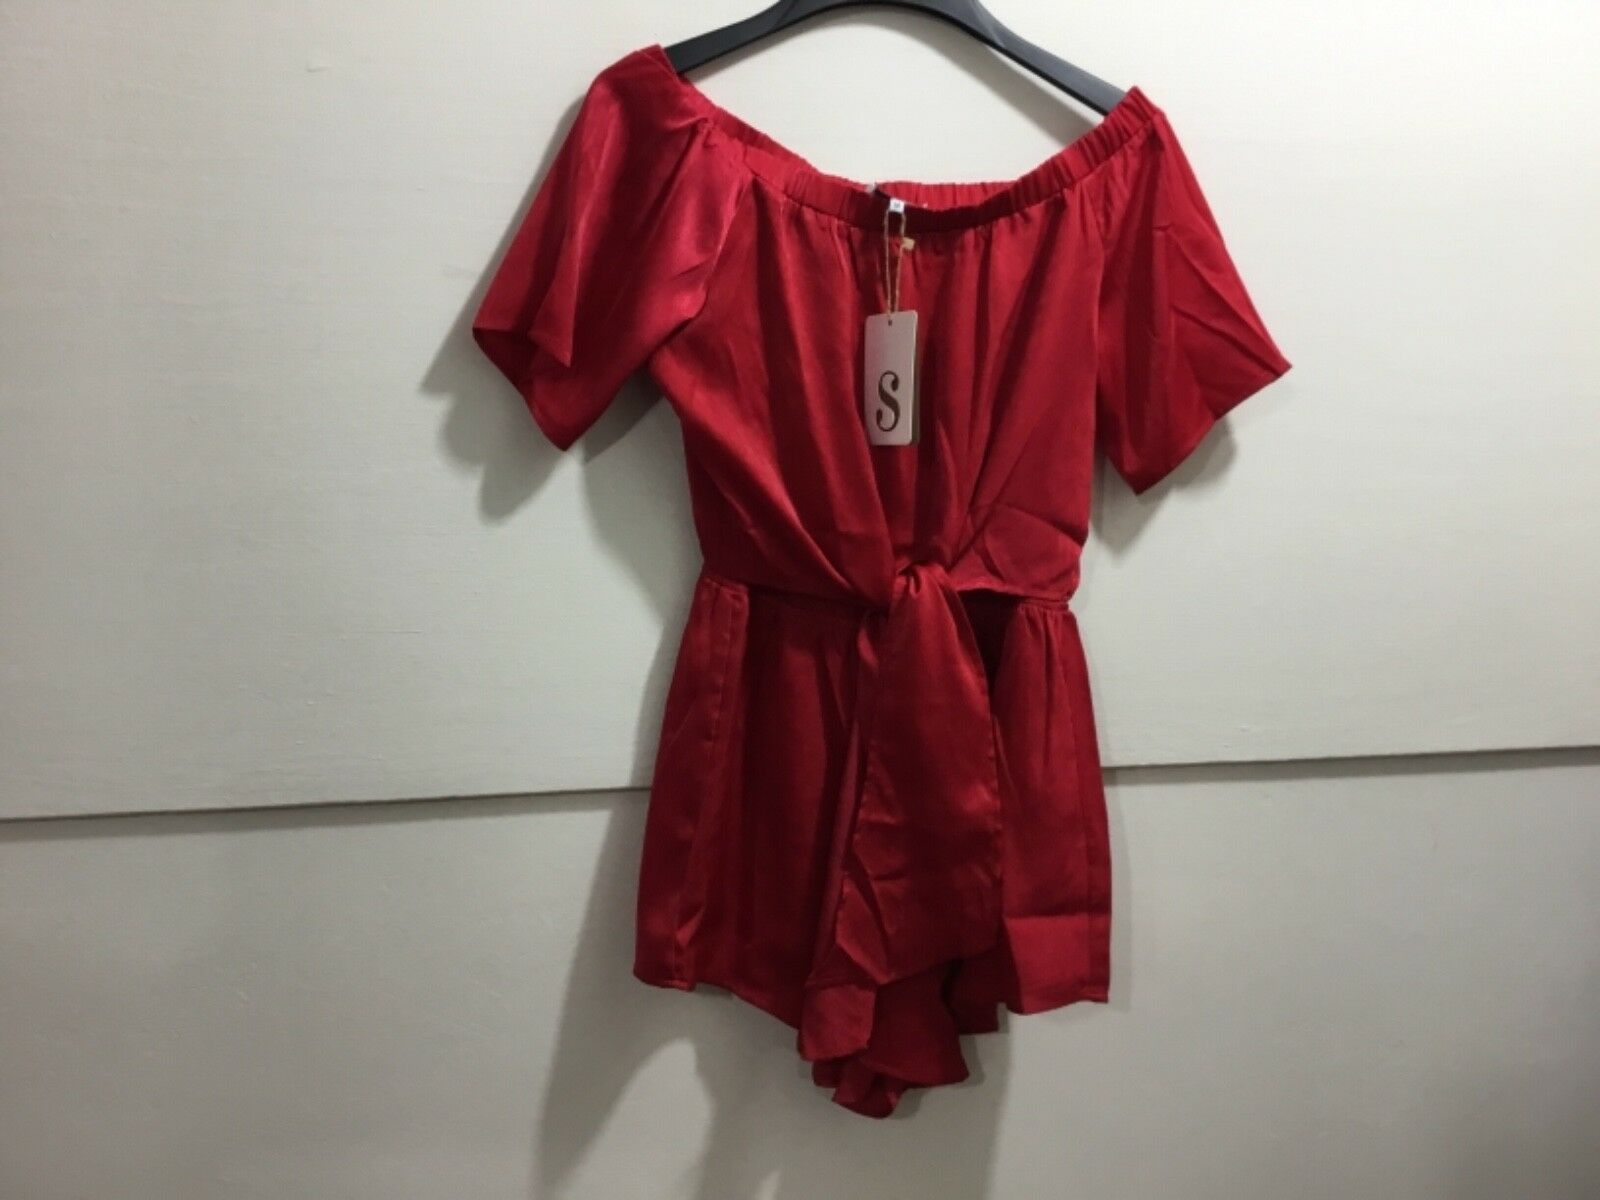 Saba skirt ladies medium NWT adorable red short romper